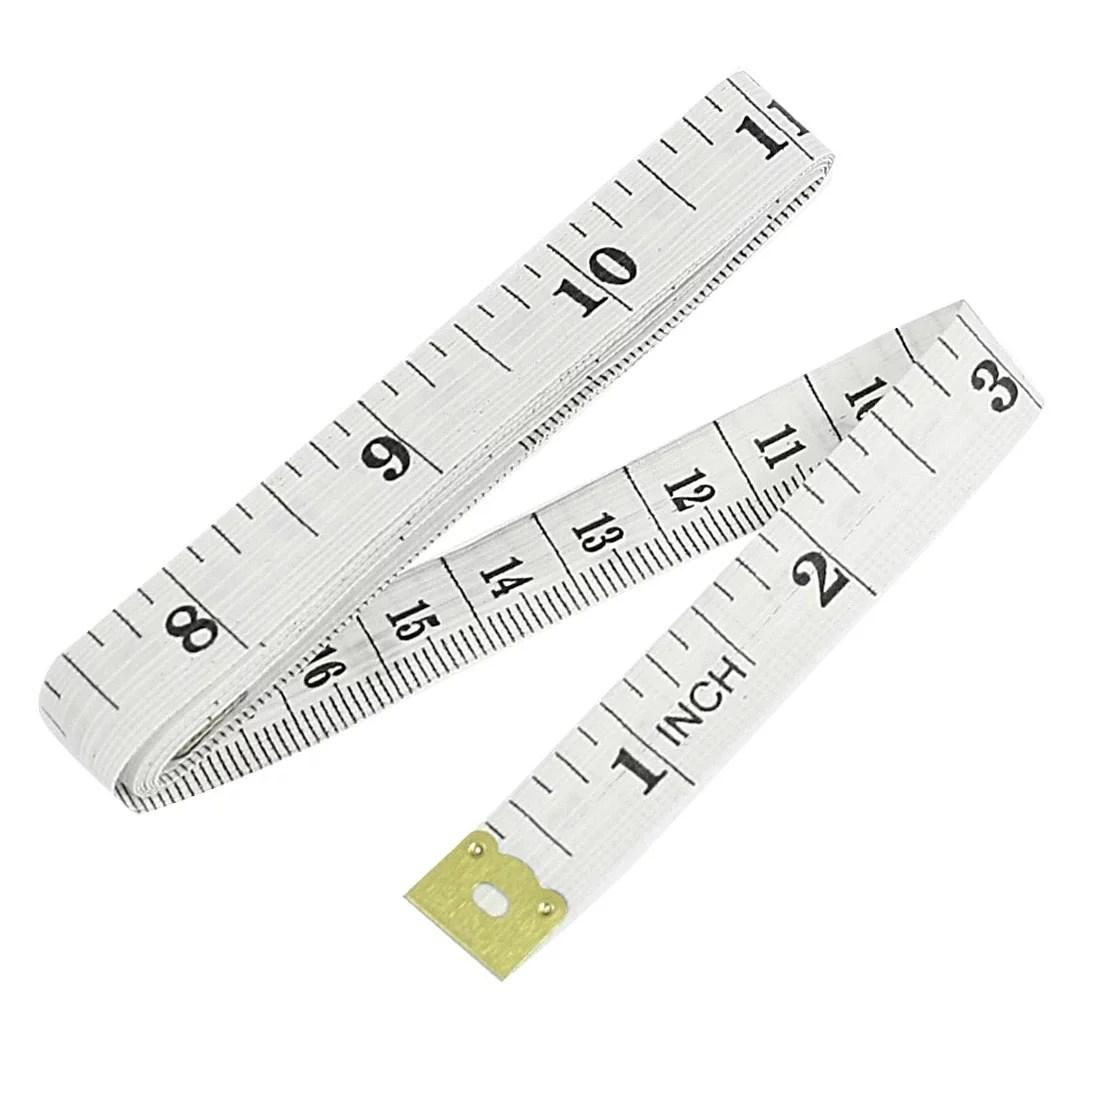 60 Inch Metric Tape Measure Tailor Sewing Cloth Ruler